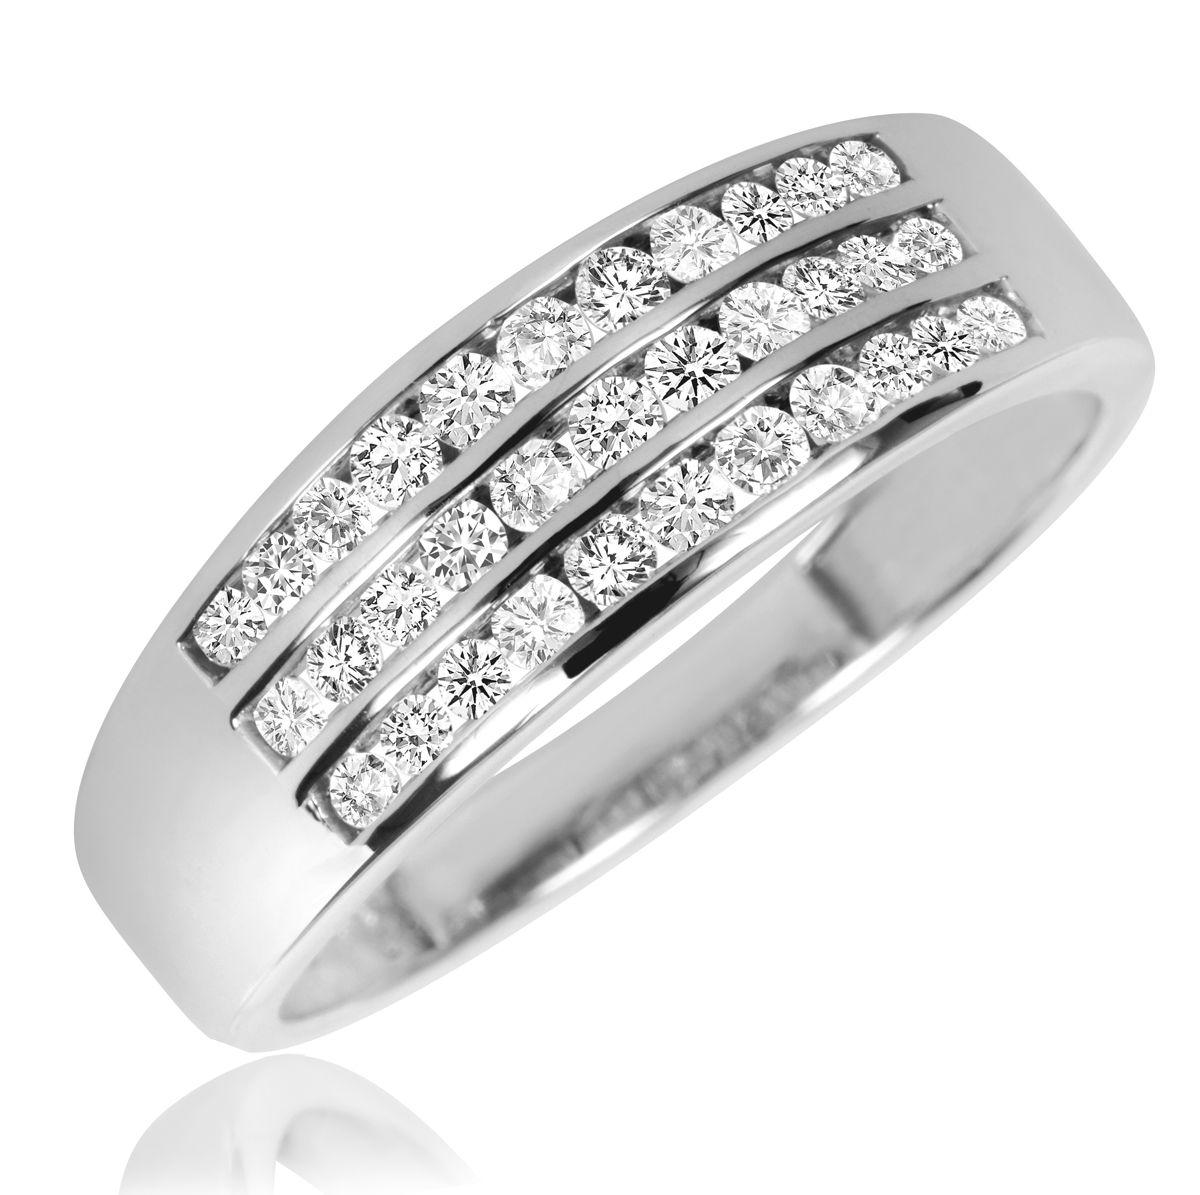 Encienda Mens Diamond Wedding Bands Mens Wedding Rings Mens Wedding Bands White Gold